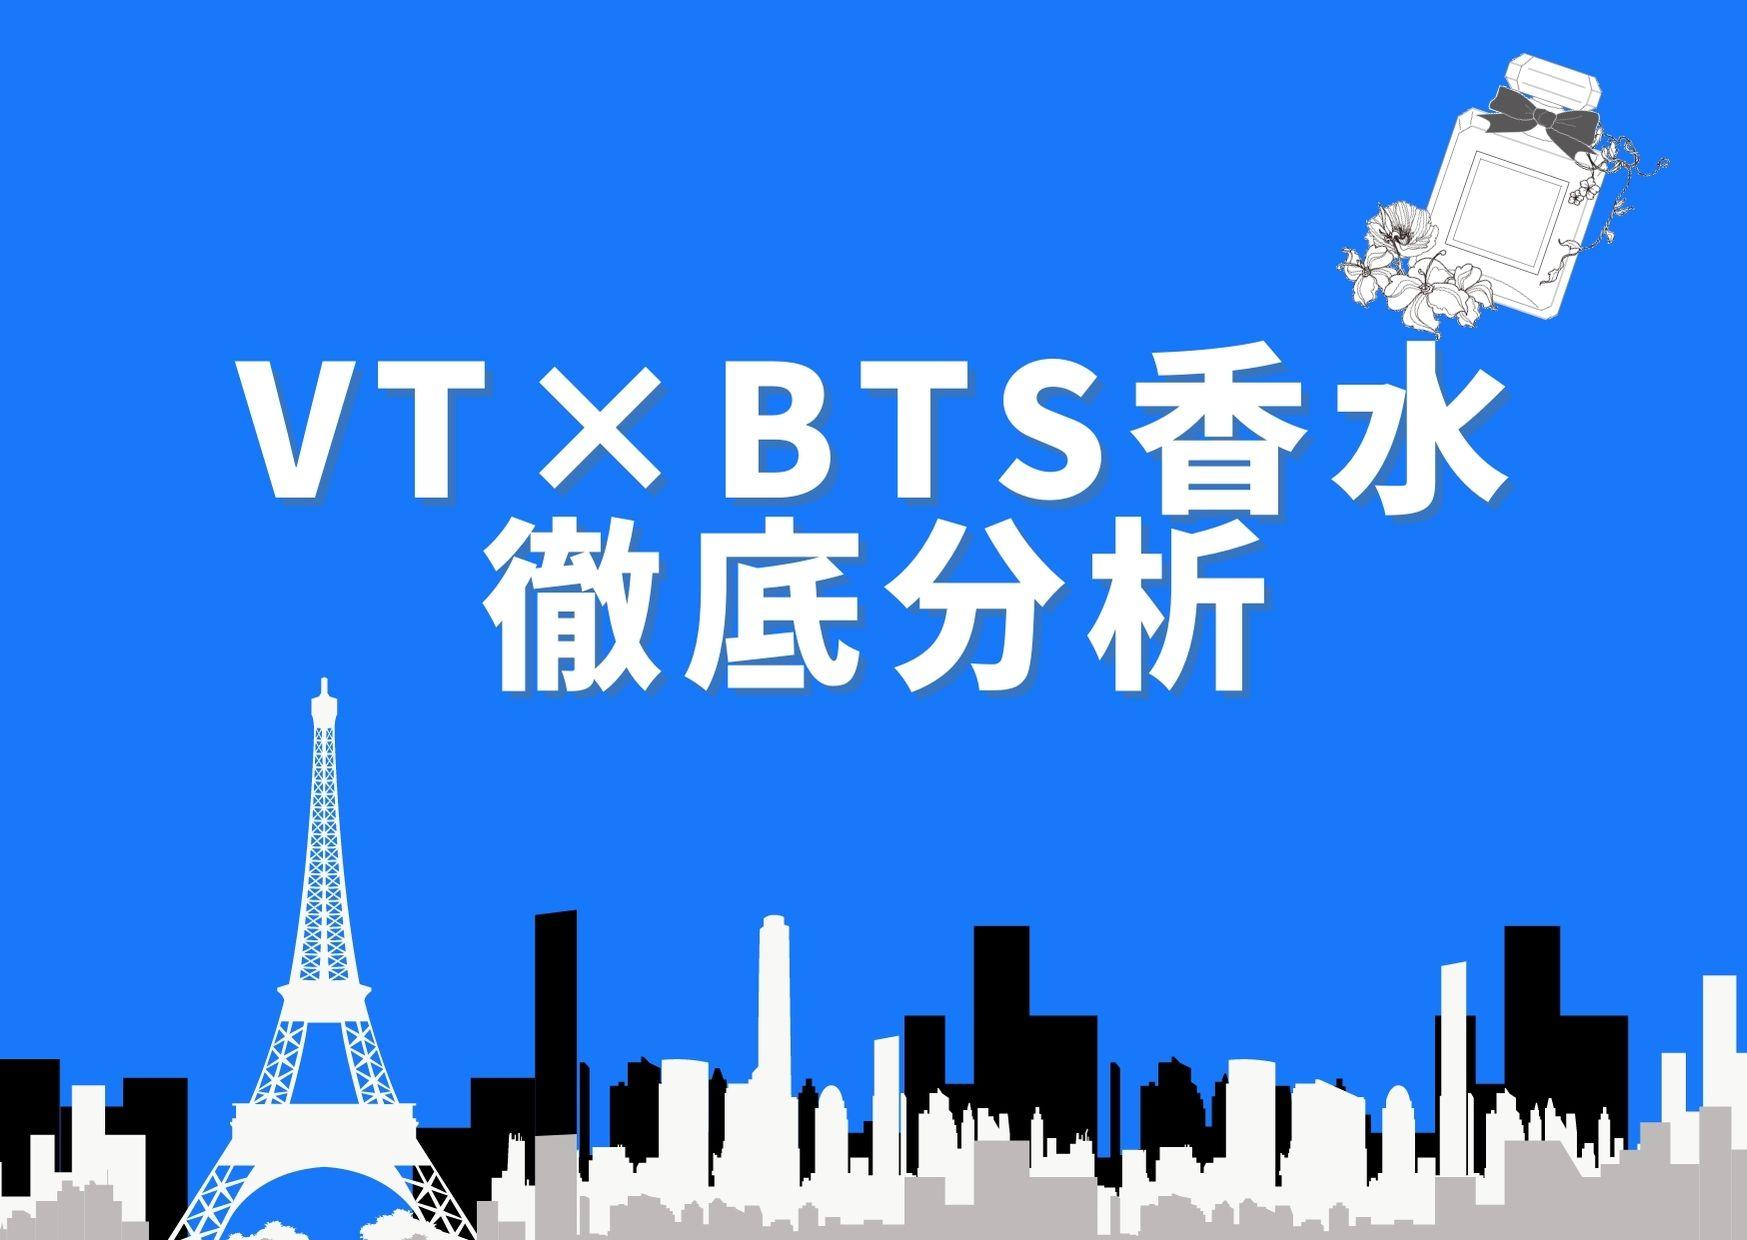 VT×BTS香水全メンバーの香りをスタイリストが分析解説